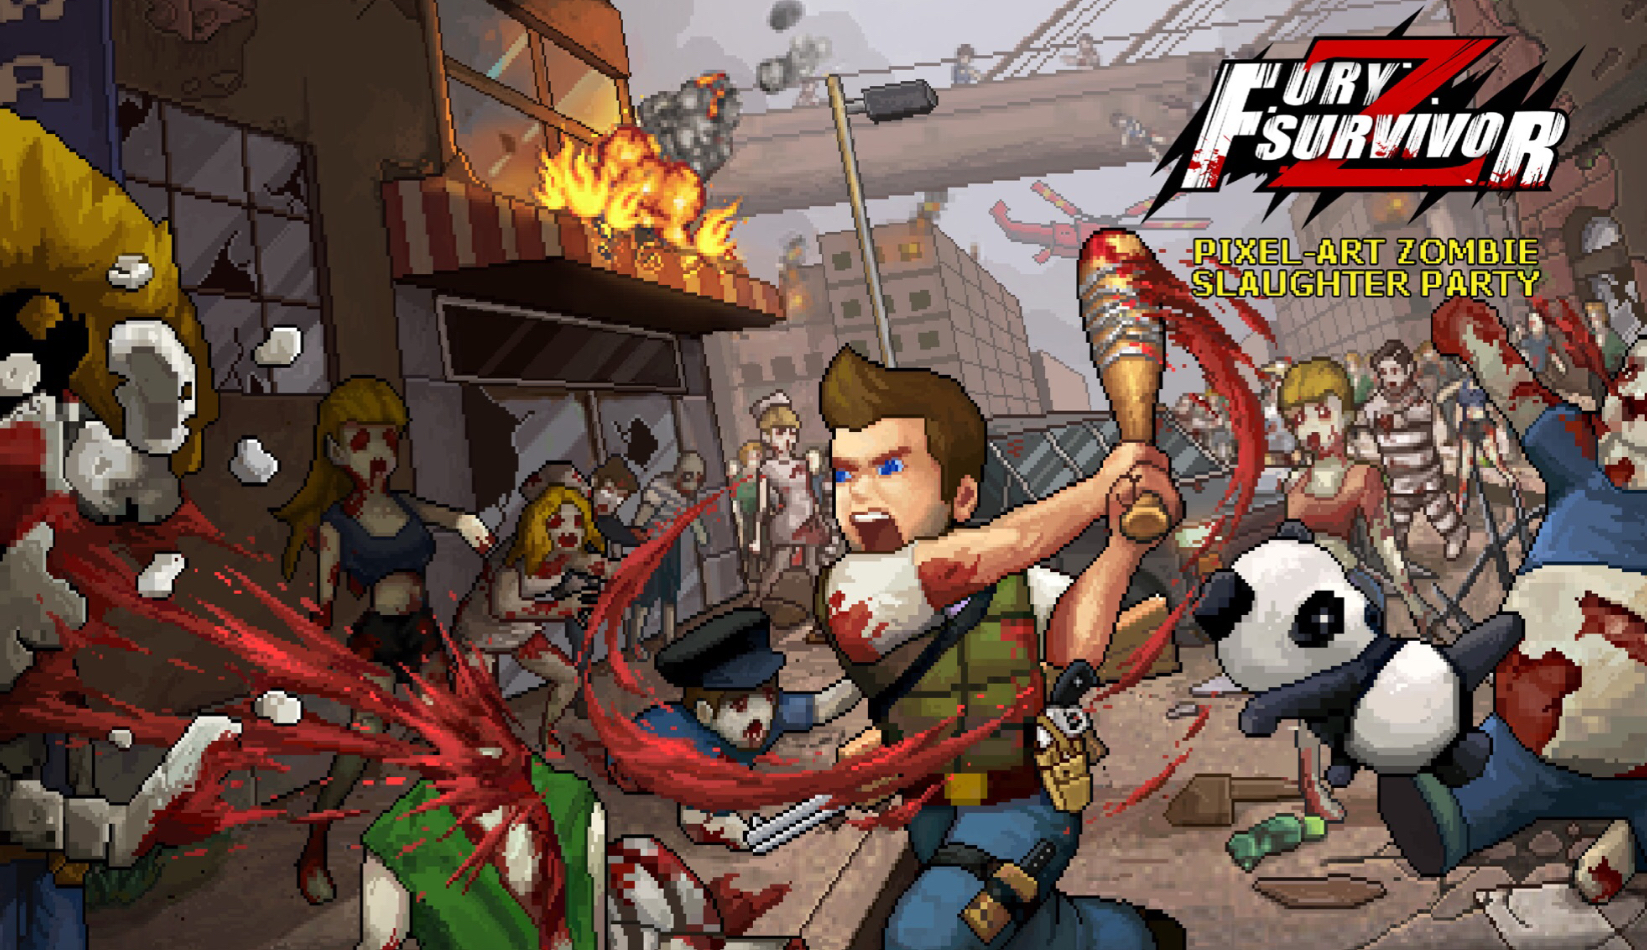 Fury Survivor: Pixel Z' is a hack and slash game with RPG elements